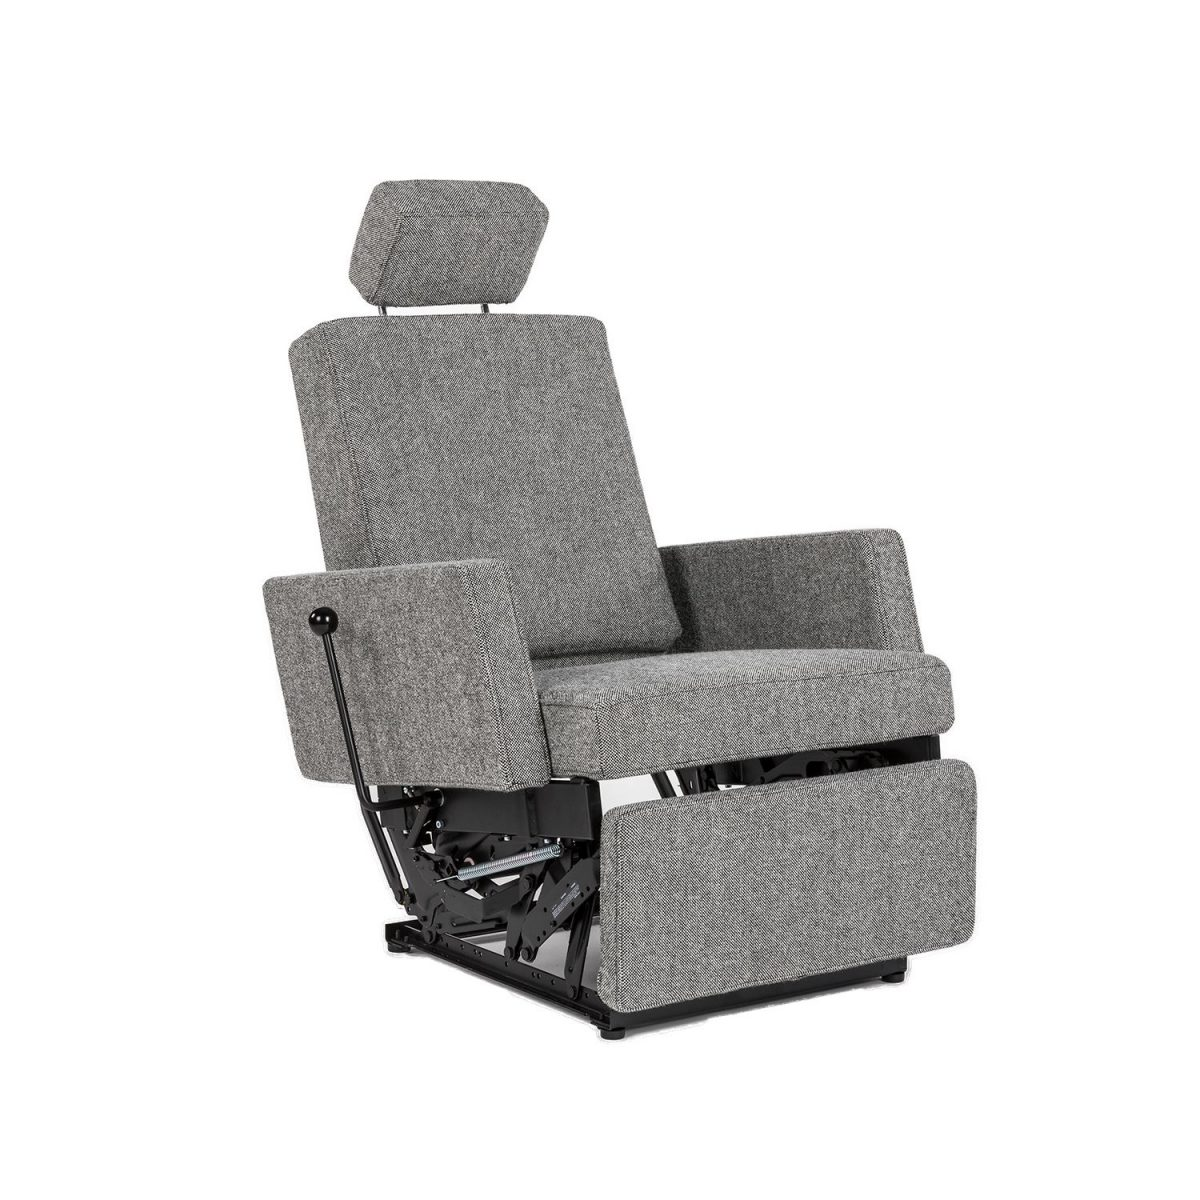 Atelier Van Lieshout Lazy Modernist Loungestoel Comfortabel